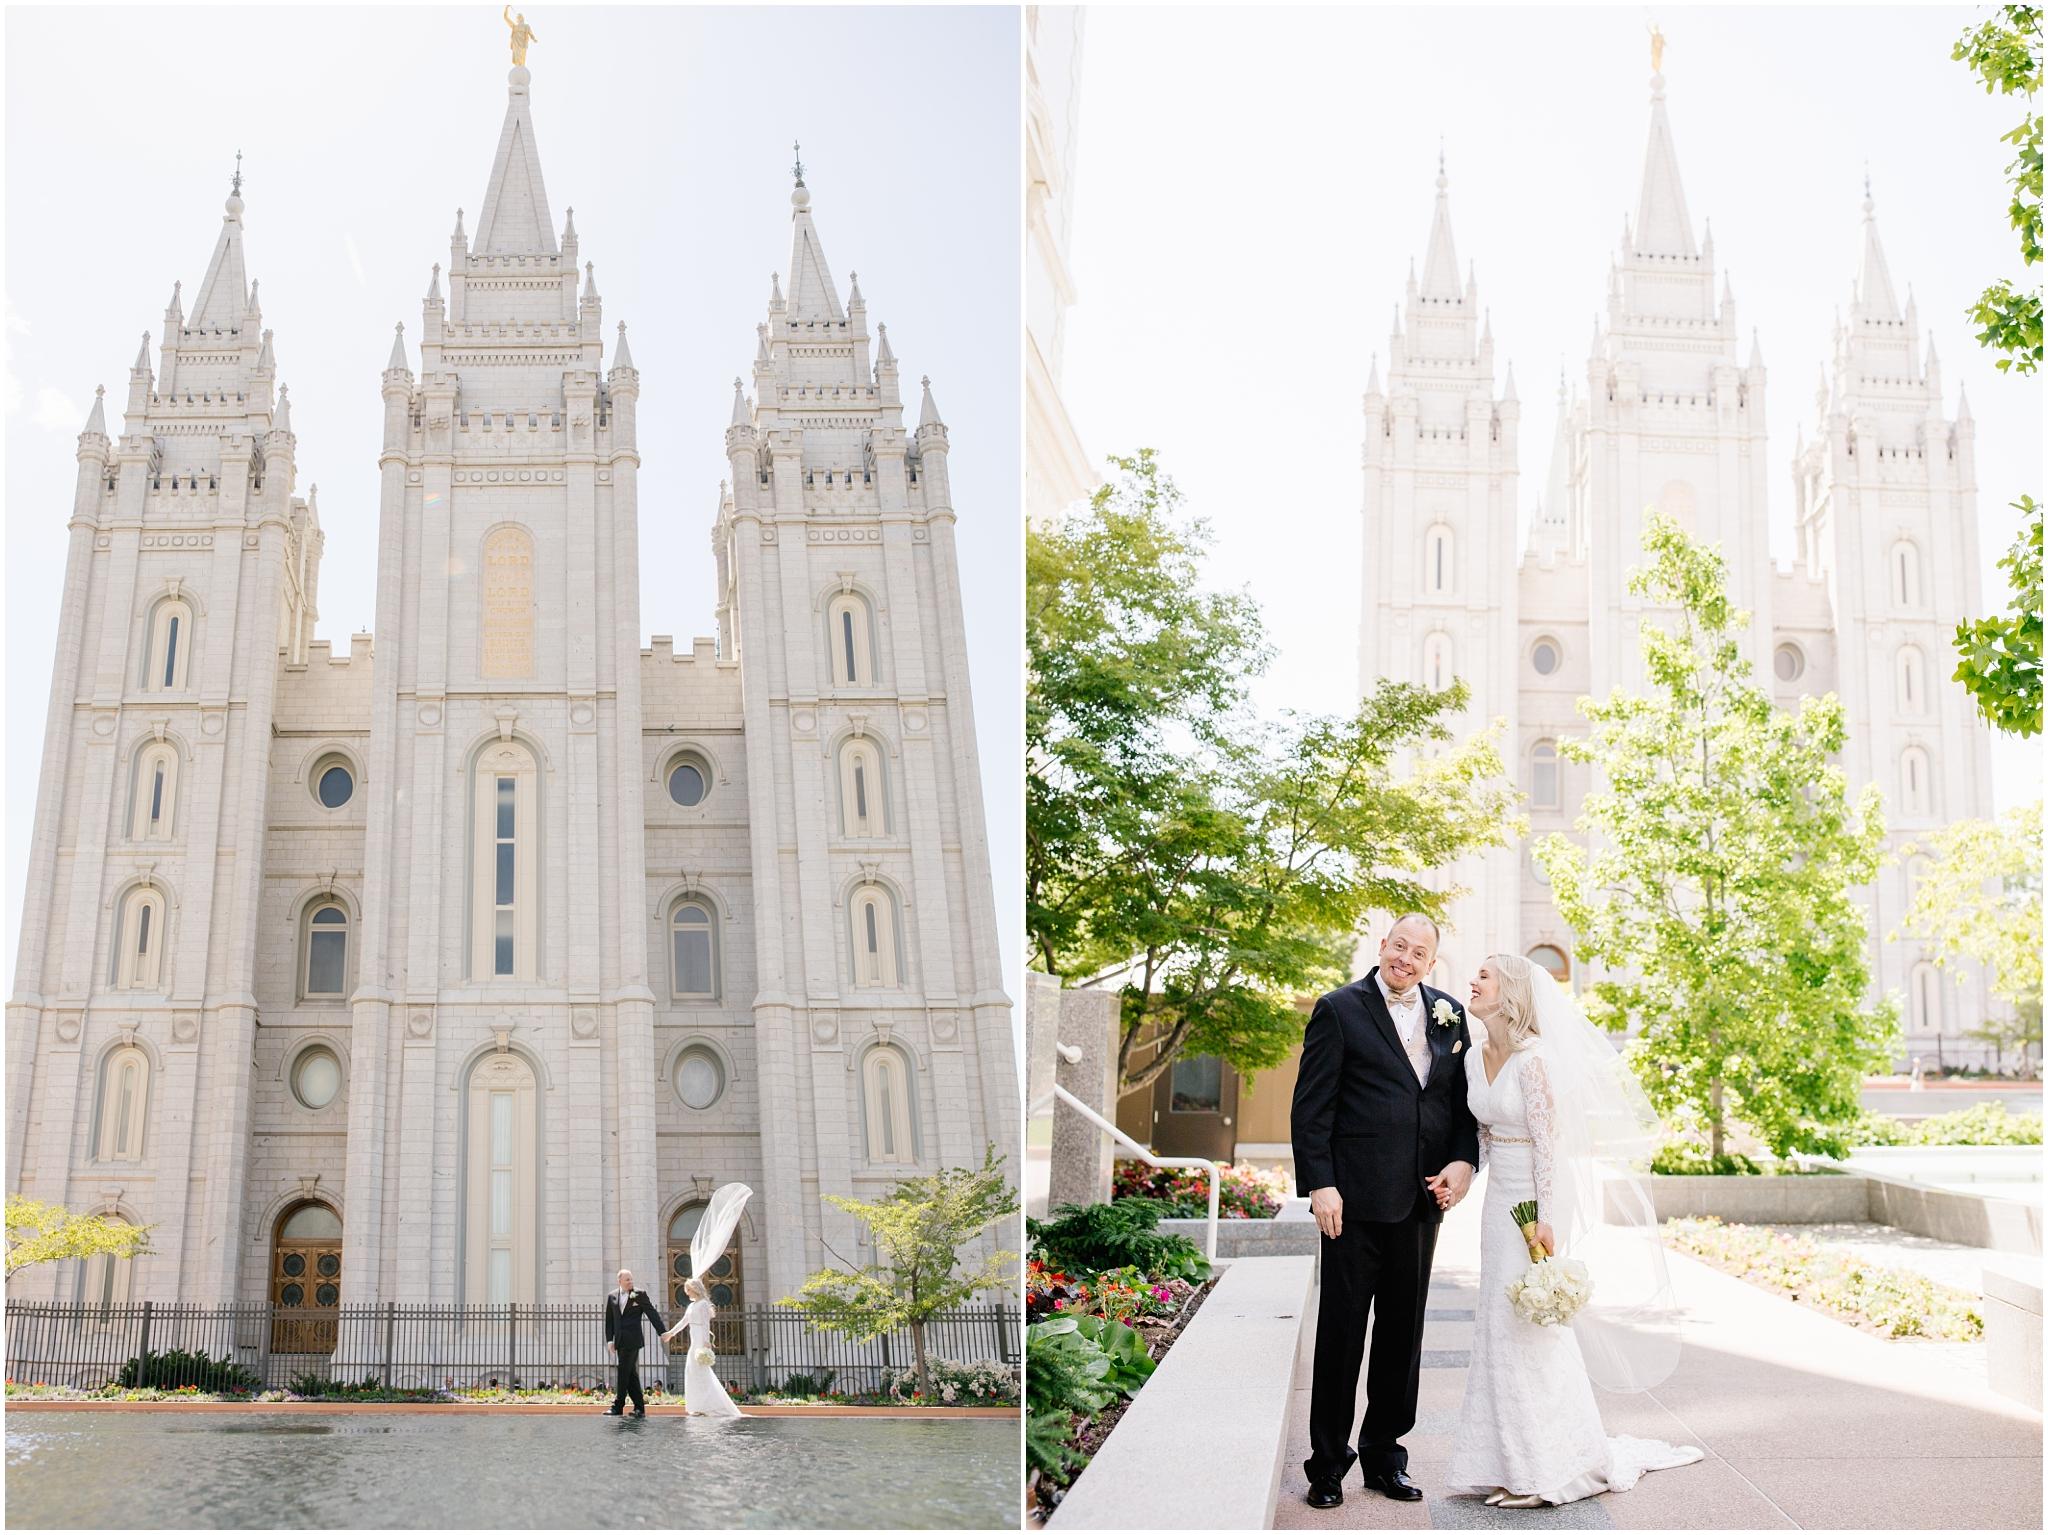 CherylandTyler-239_Lizzie-B-Imagery-Utah-Wedding-Photographer-Salt-Lake-City-Temple-Wells-Fargo-Building-Reception.jpg